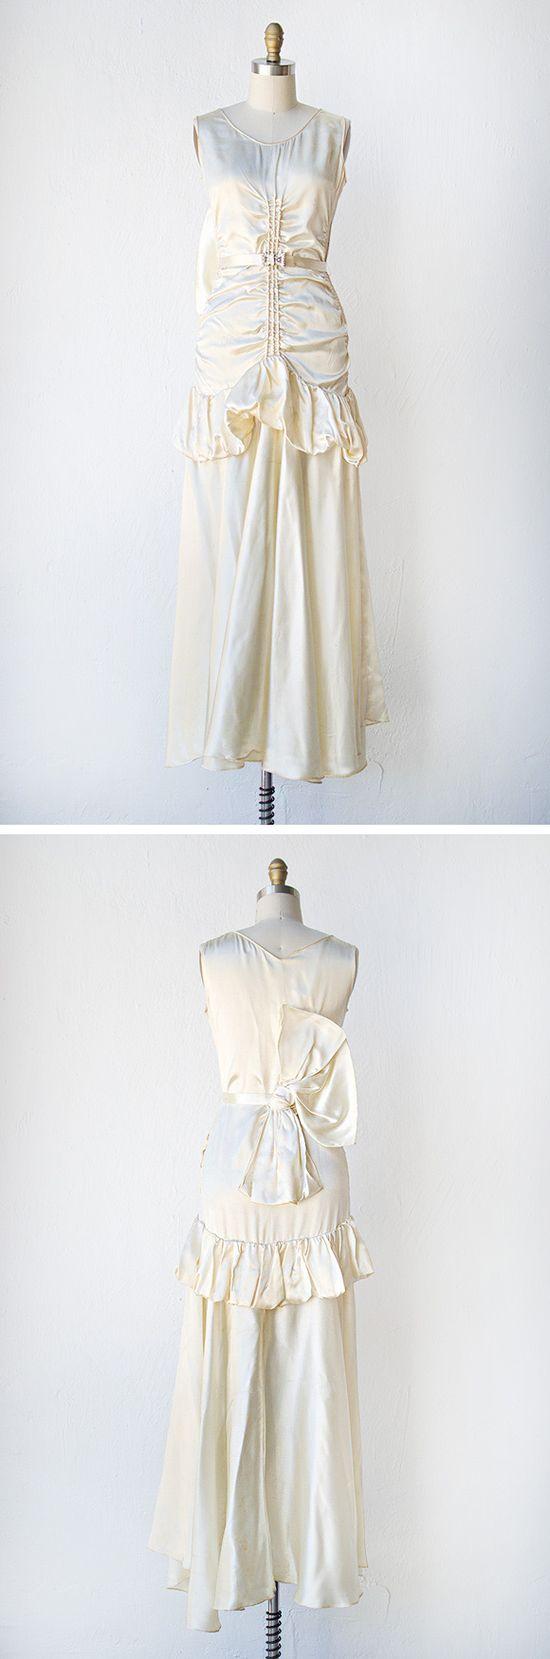 vintage 1930s wedding dress